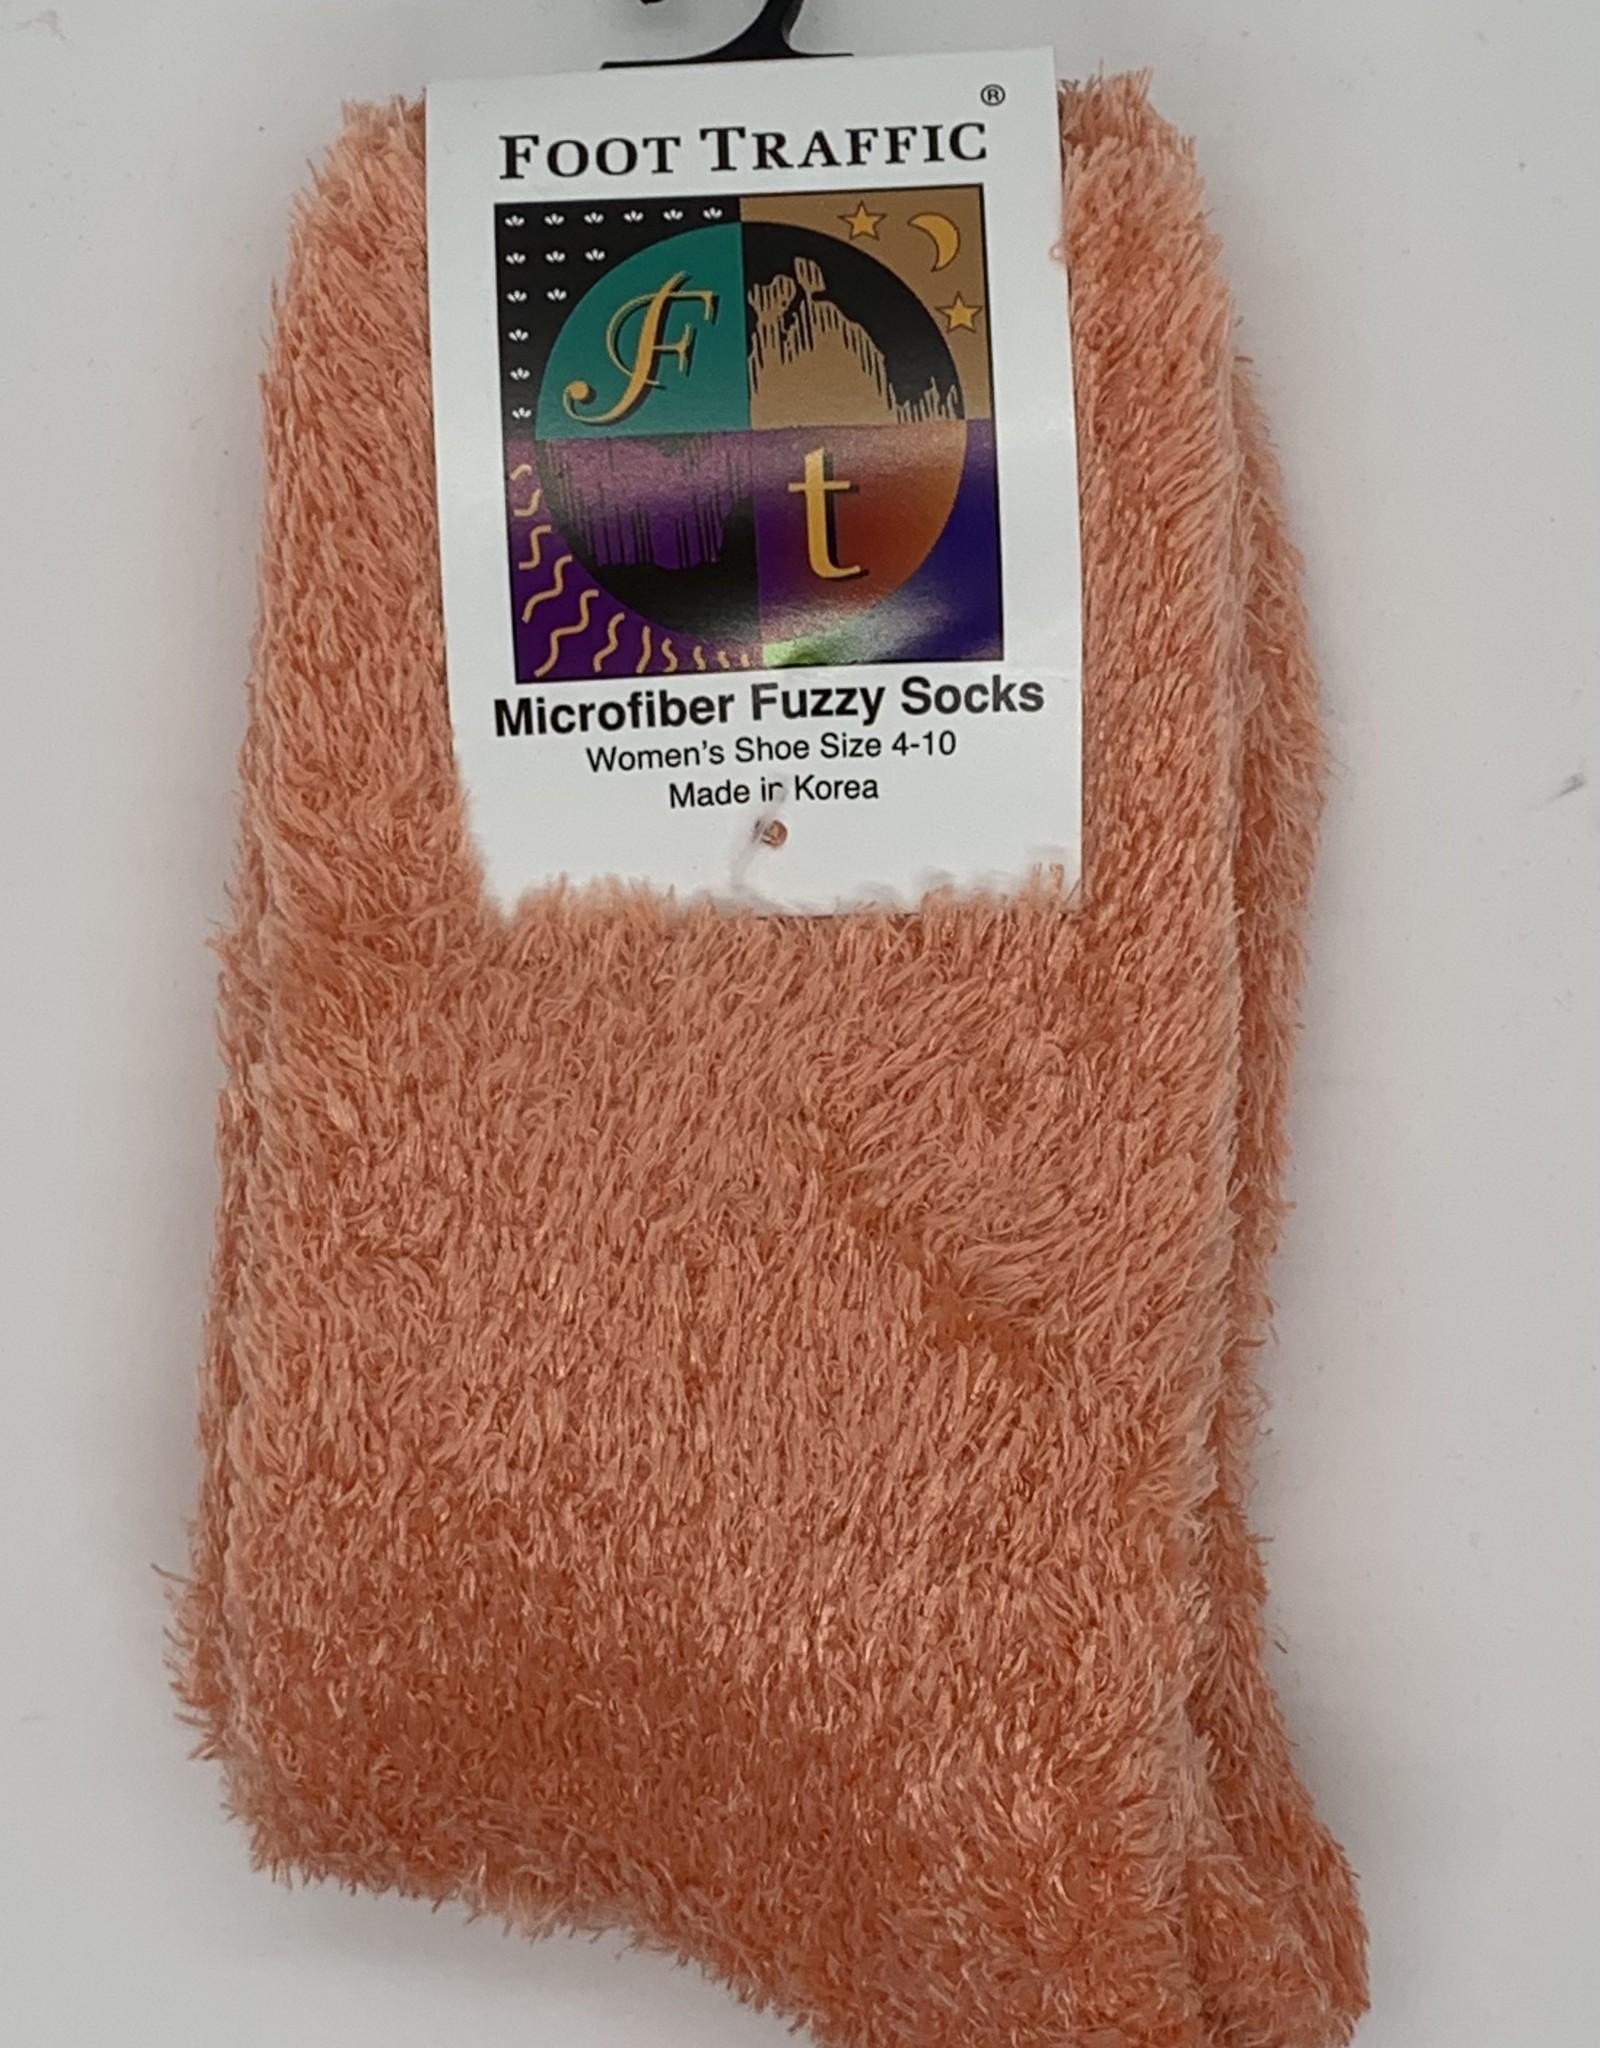 FOOT TRAFFIC Microfiber Fuzzy Socks-Coral